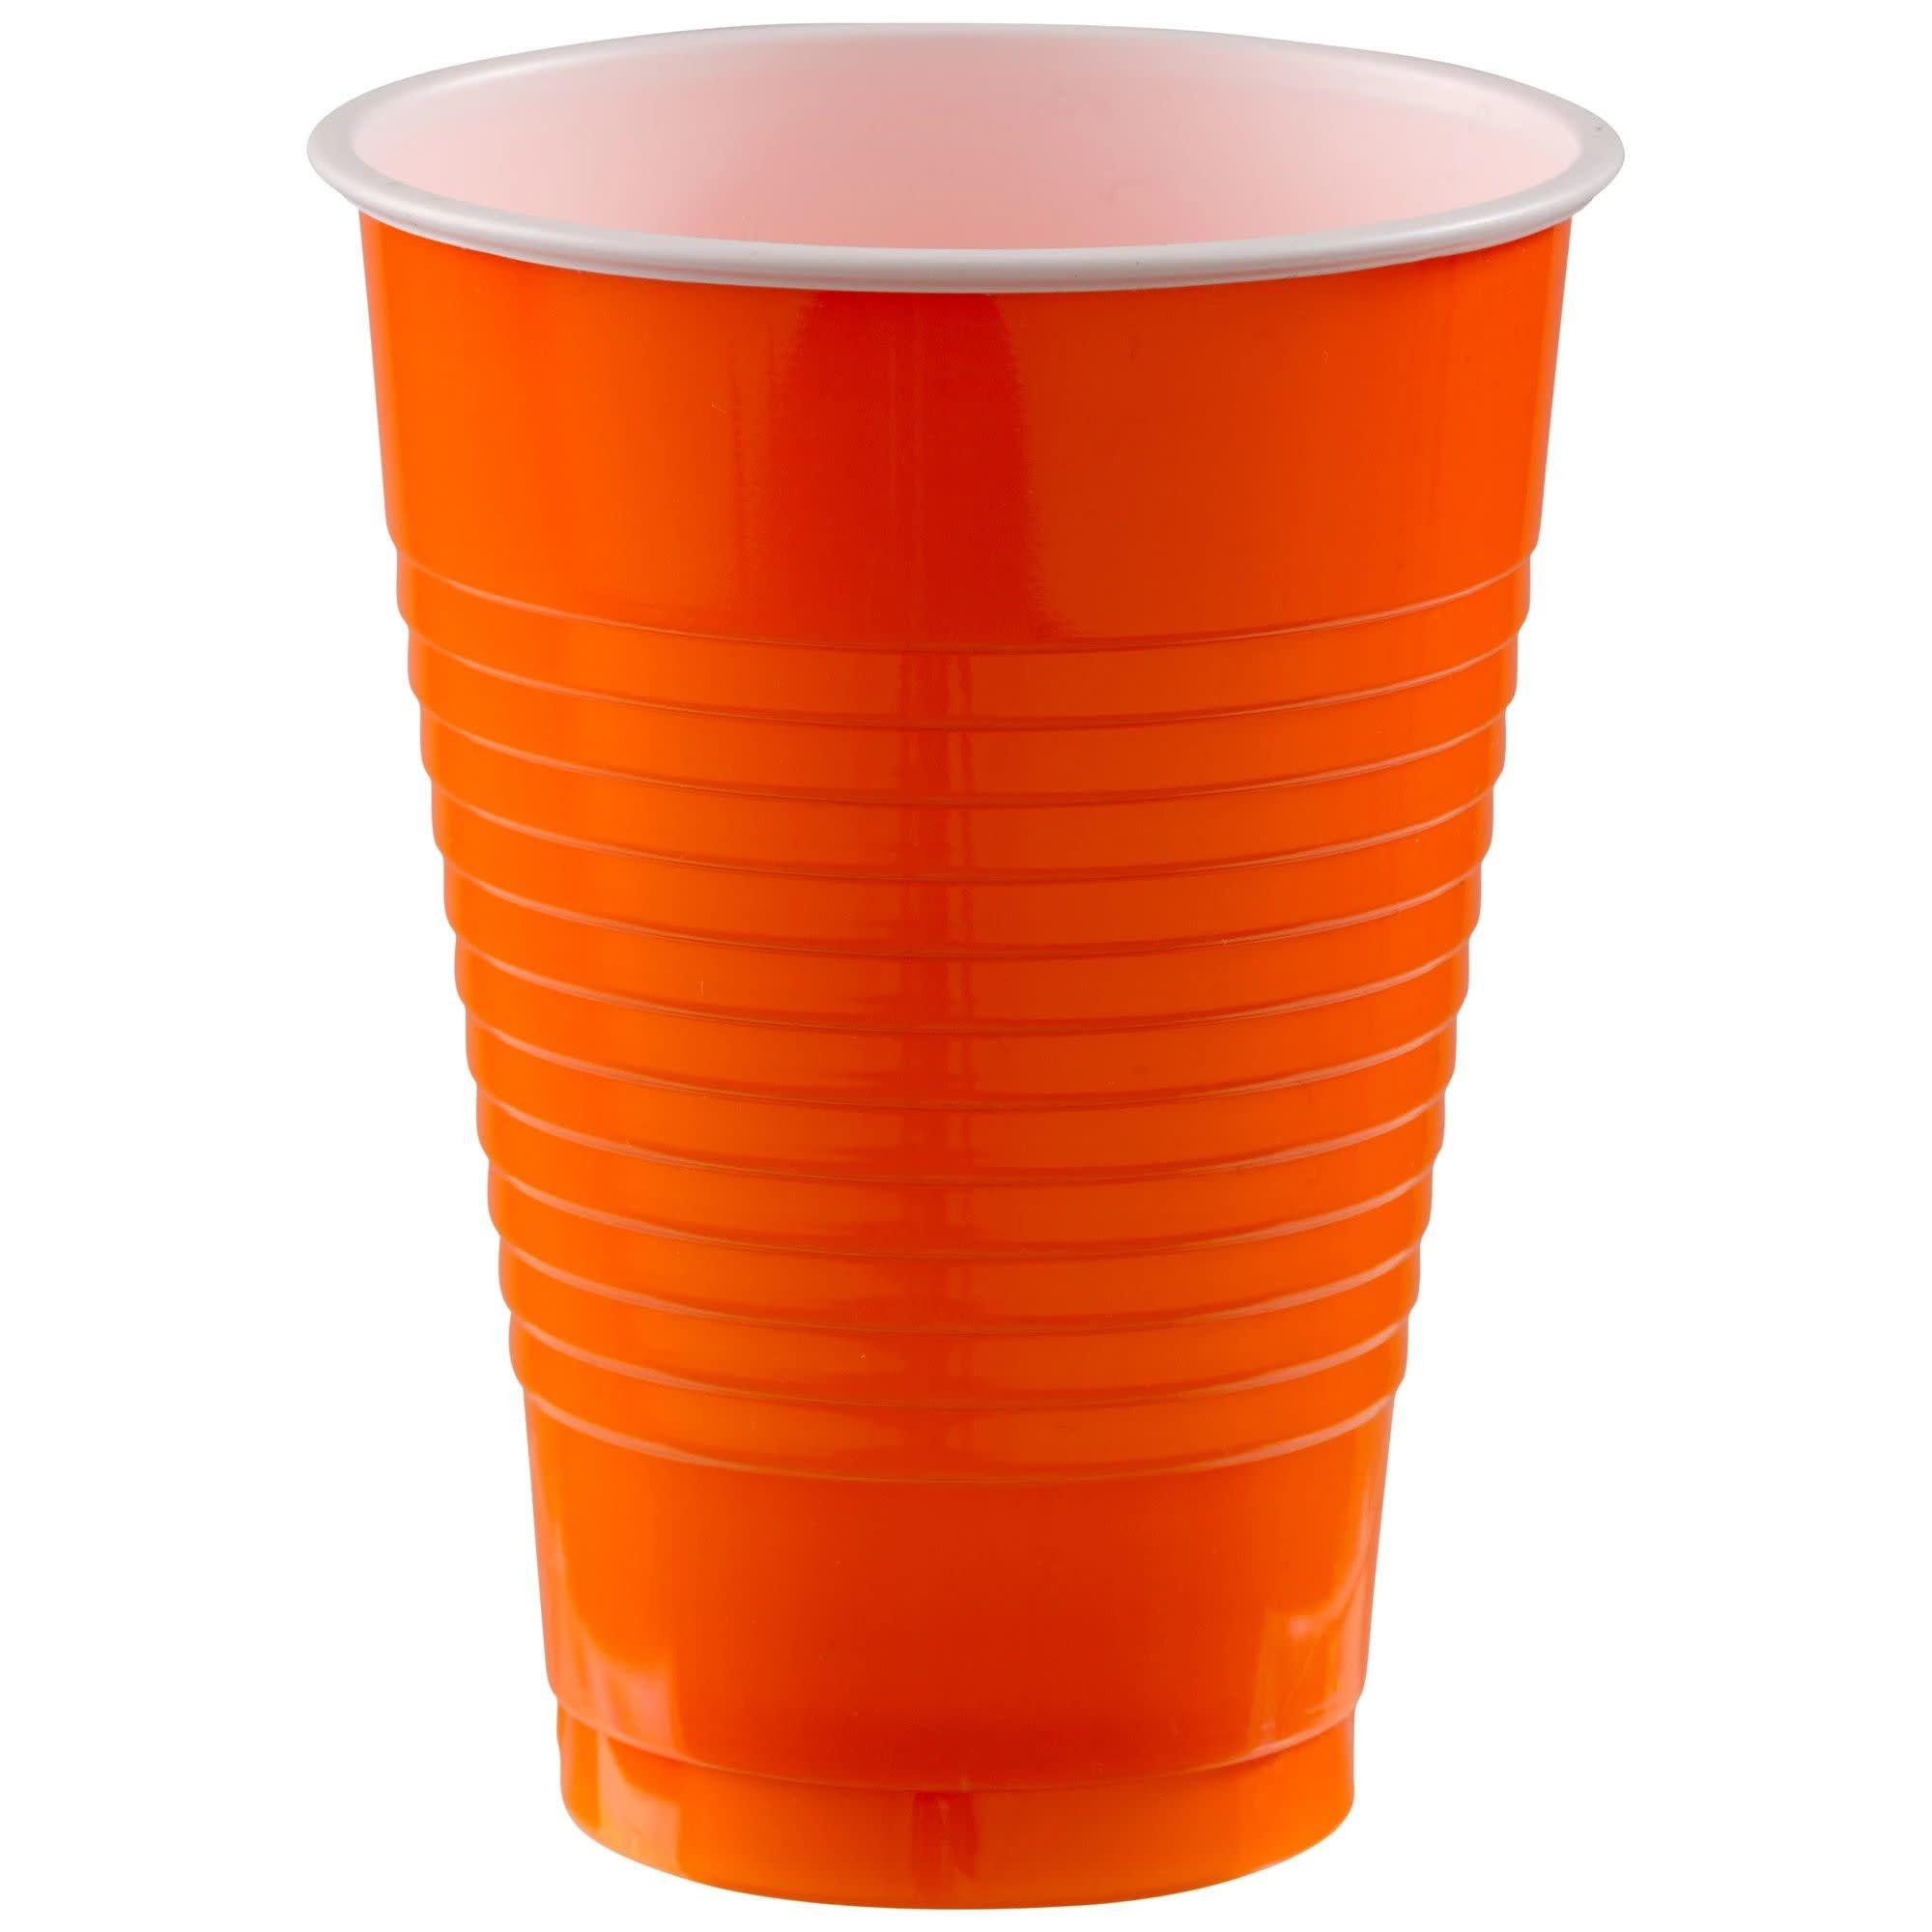 12 Oz. Plastic Cups, Mid Ct. - Orange Peel